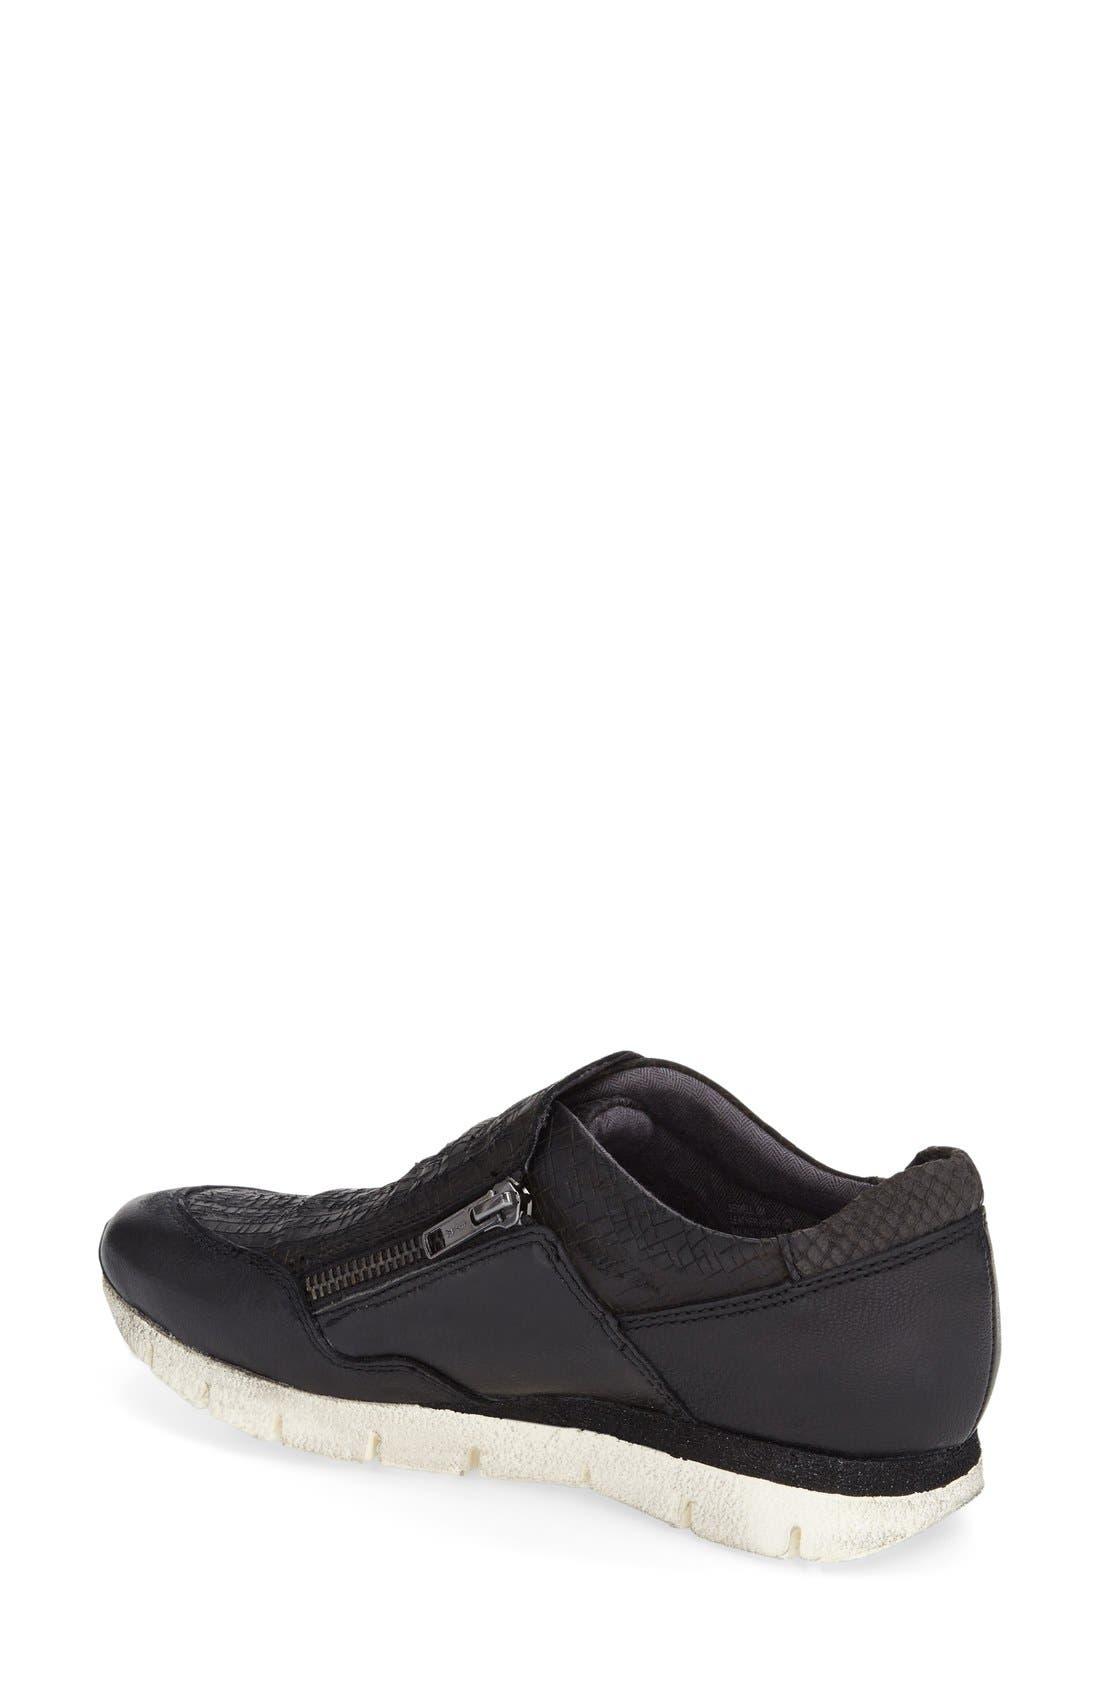 'Sewell' Sneaker,                             Alternate thumbnail 2, color,                             001